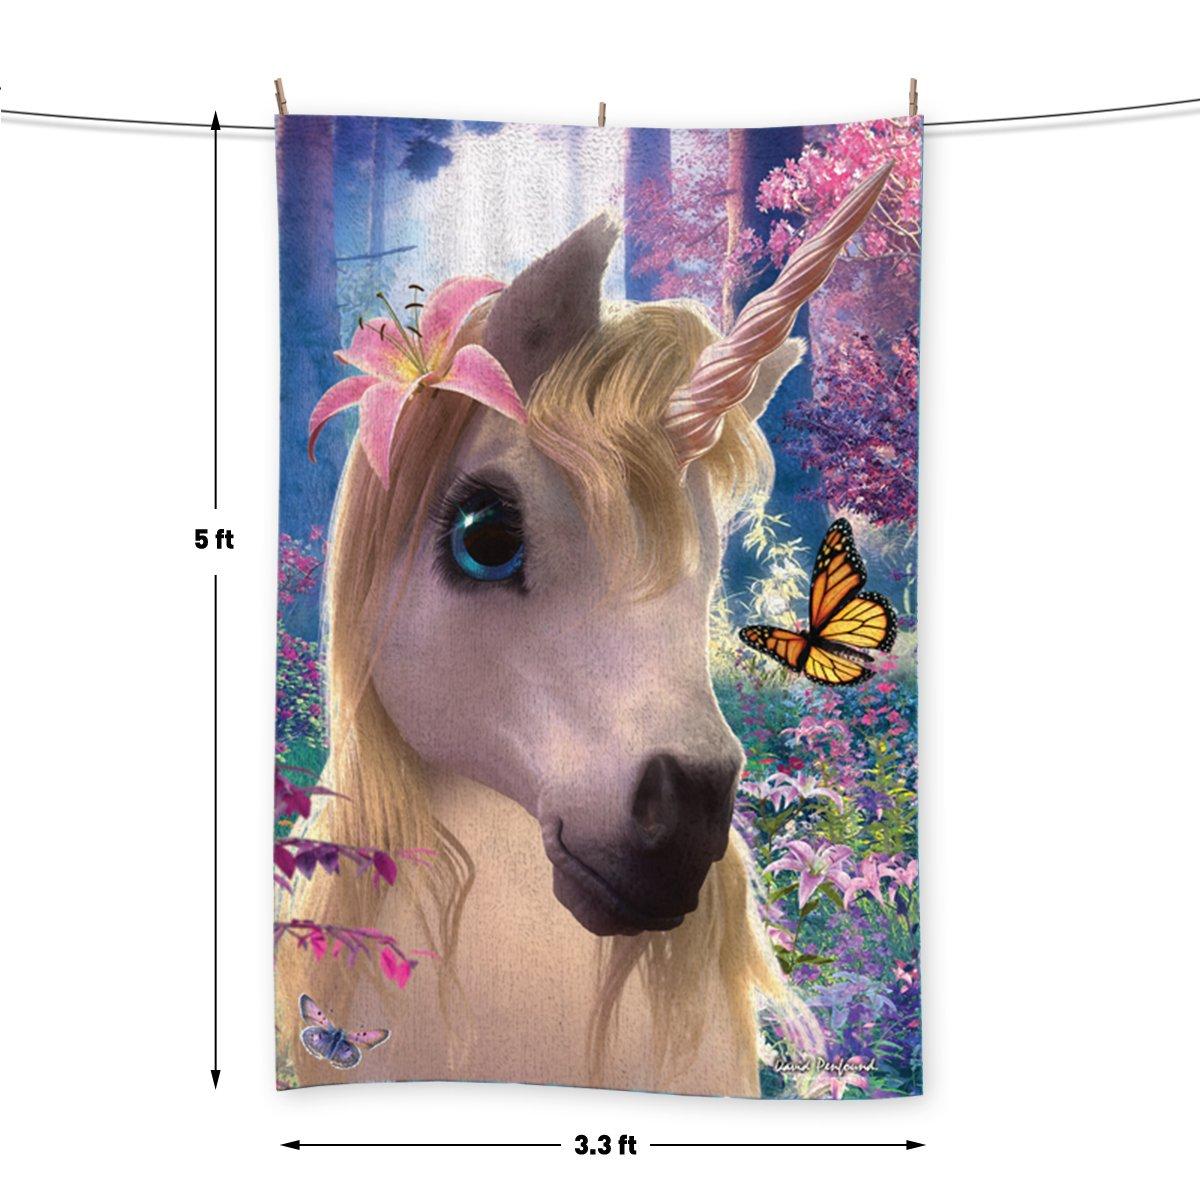 Sparkle el unicornio - por David Penfound - Toalla - 5 FT X 3.3 ft (60 x 40 cm): Amazon.es: Hogar